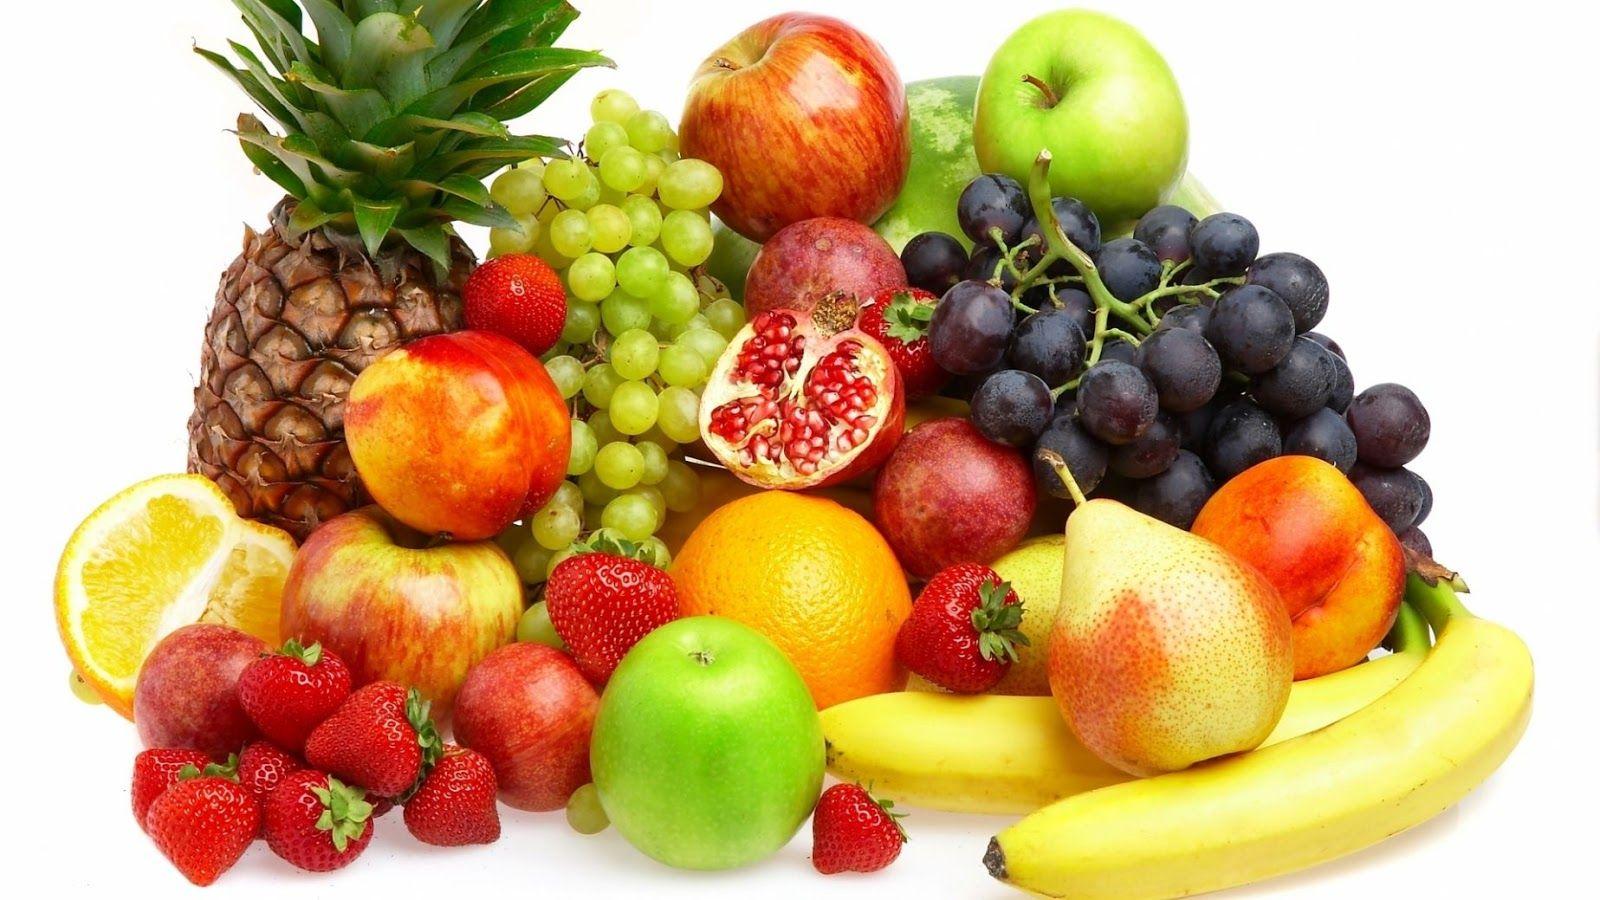 Alimentos No Perecederos Buscar Con Google Frutas Para Adelgazar Alimentos Alcalinos Comidas Para Bajar De Peso